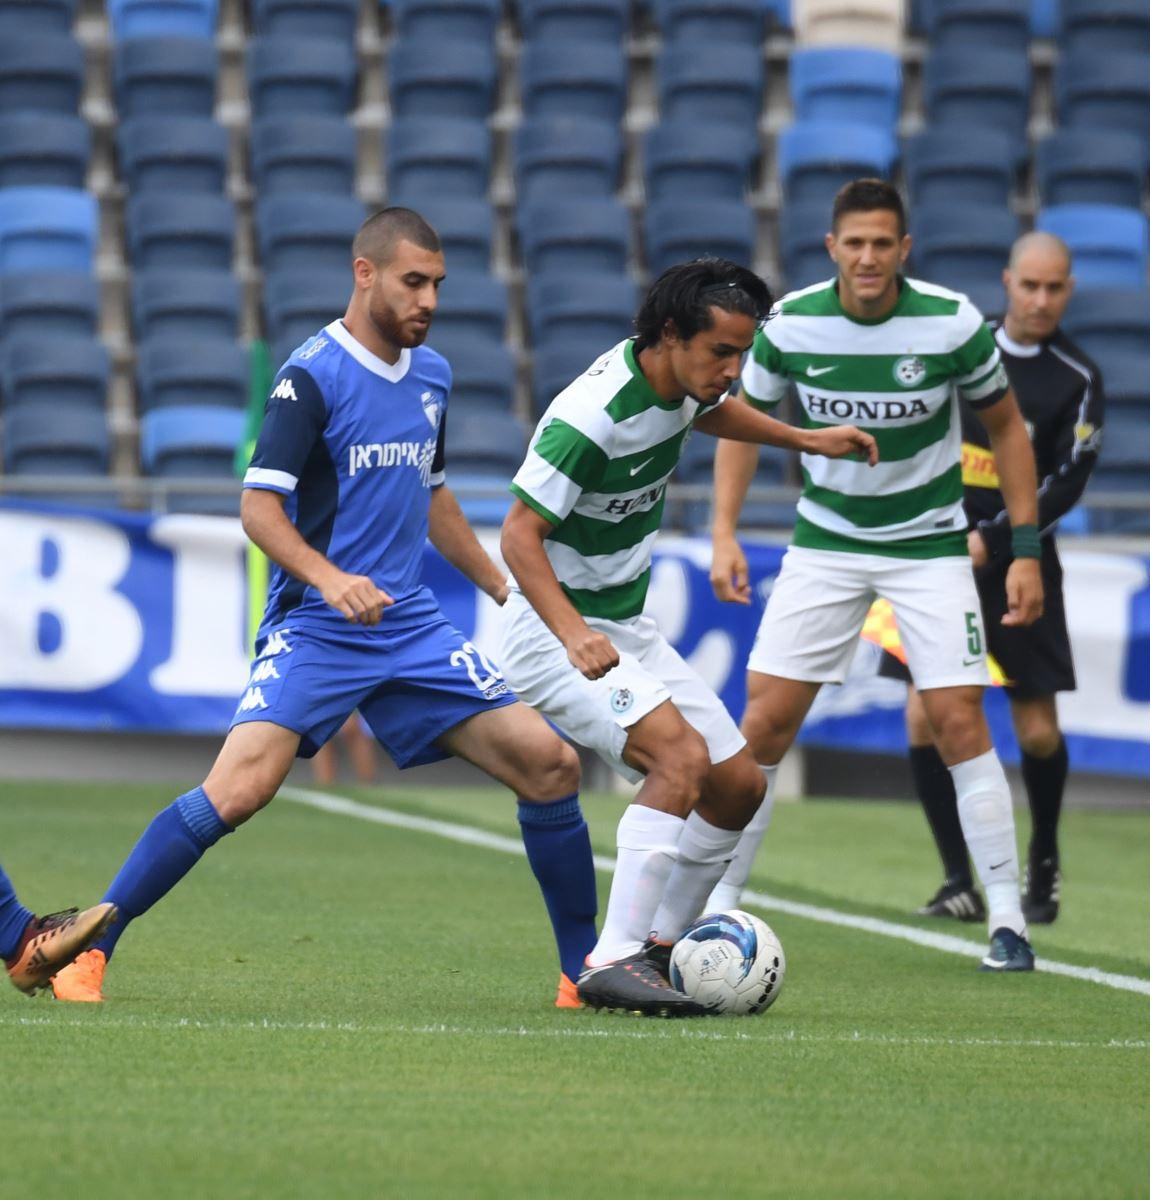 Maccabi Haifa verliest met 1-2 van Kiryat Shmona